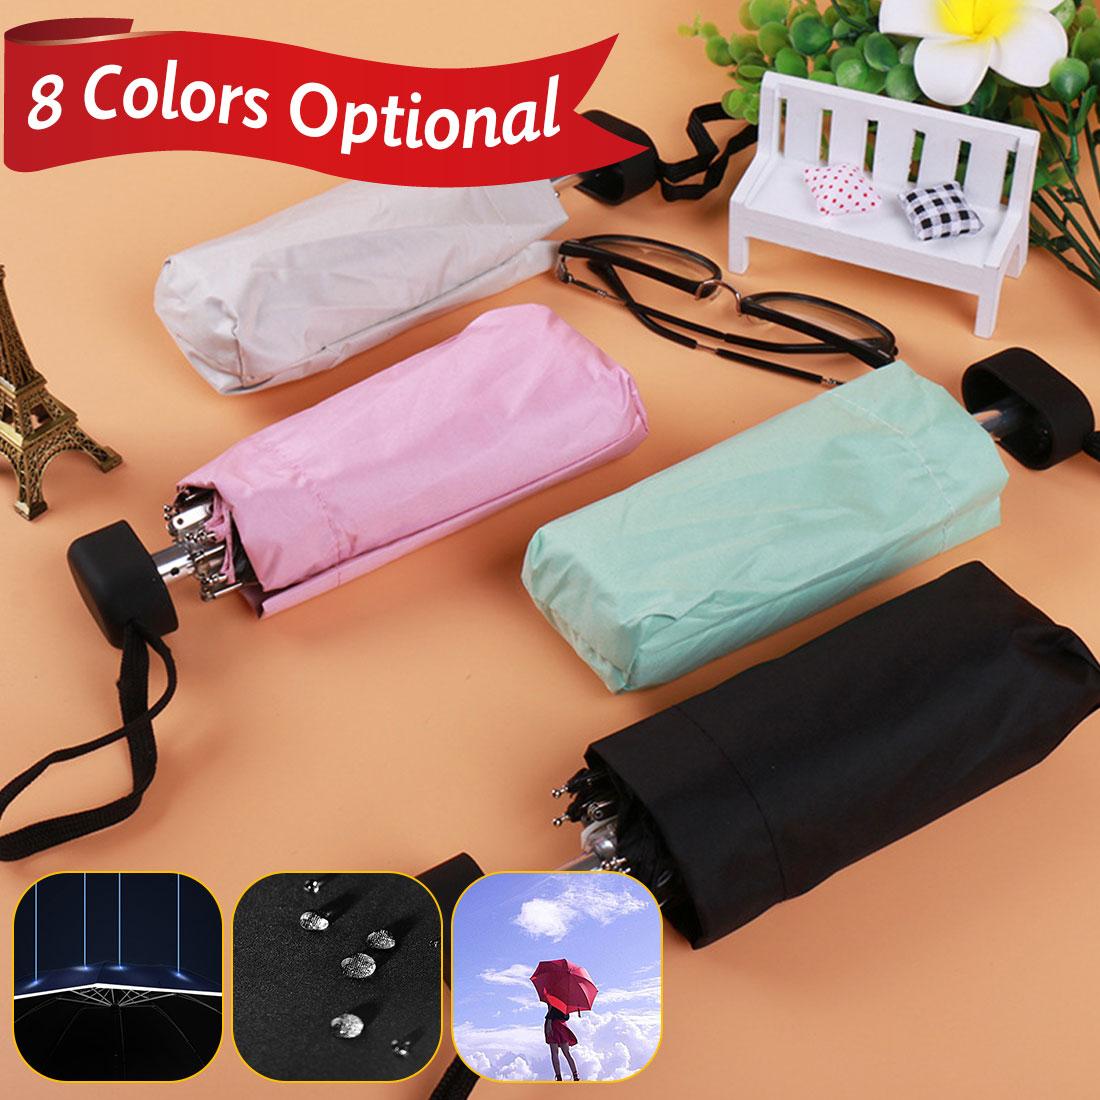 Portable Travel Umbrella 16cm Mini Folding Rain Umbrella Pocket Parasol Male Female Gift Girls Anti-UV Waterproof